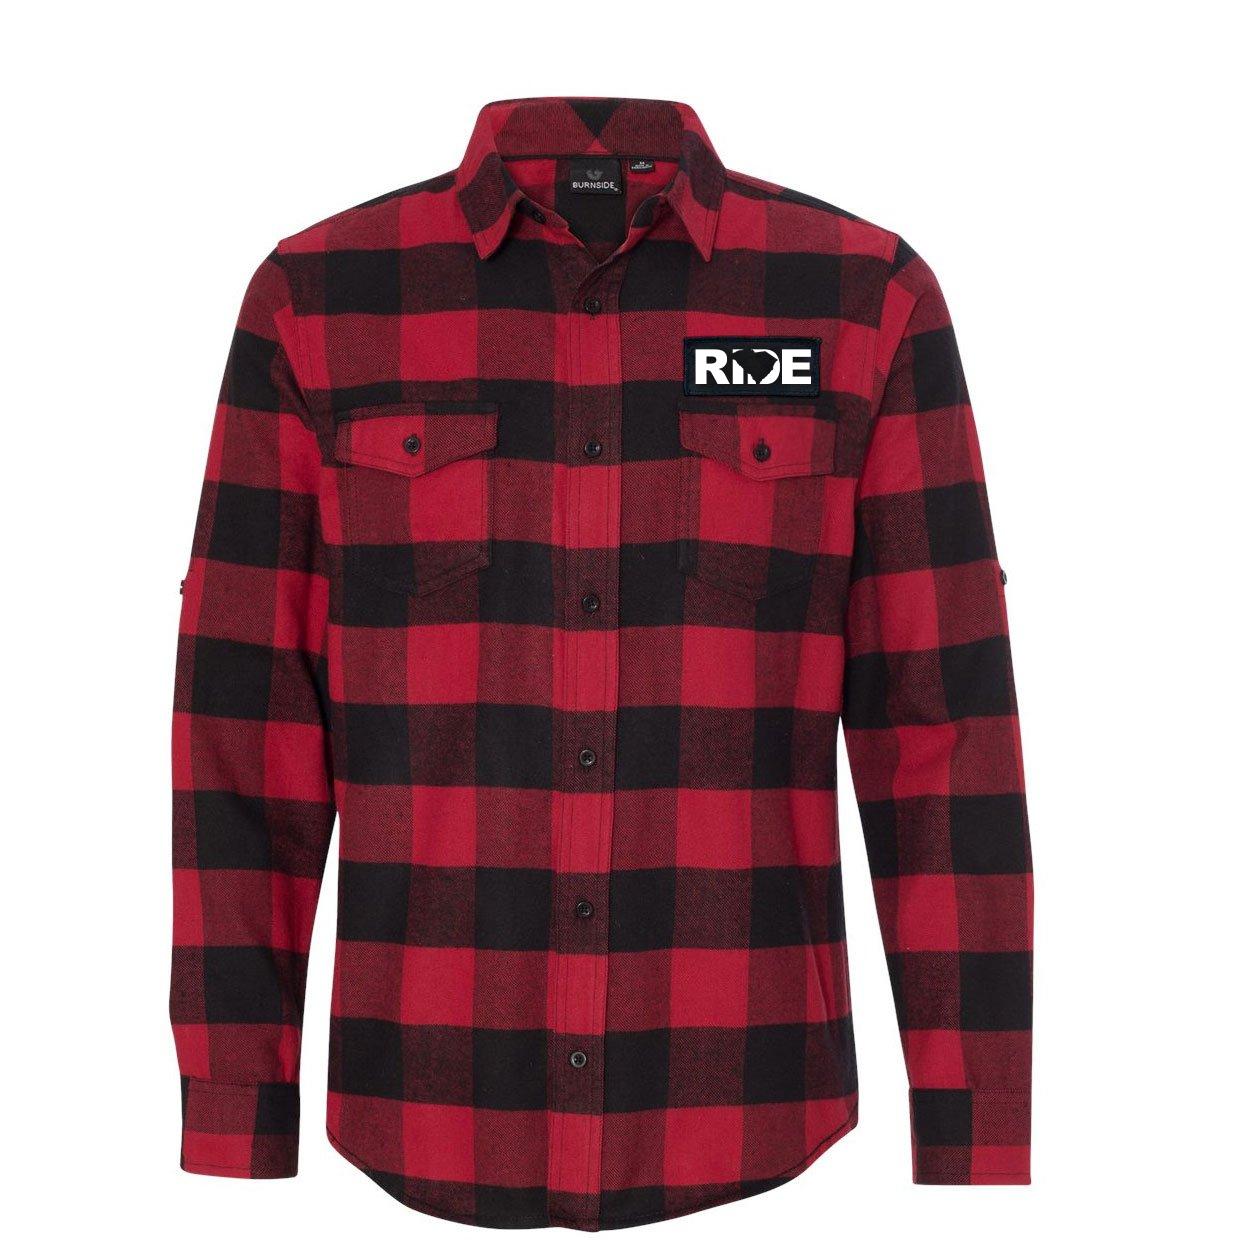 Ride South Carolina Classic Unisex Long Sleeve Woven Patch Flannel Shirt Red/Black Buffalo (White Logo)